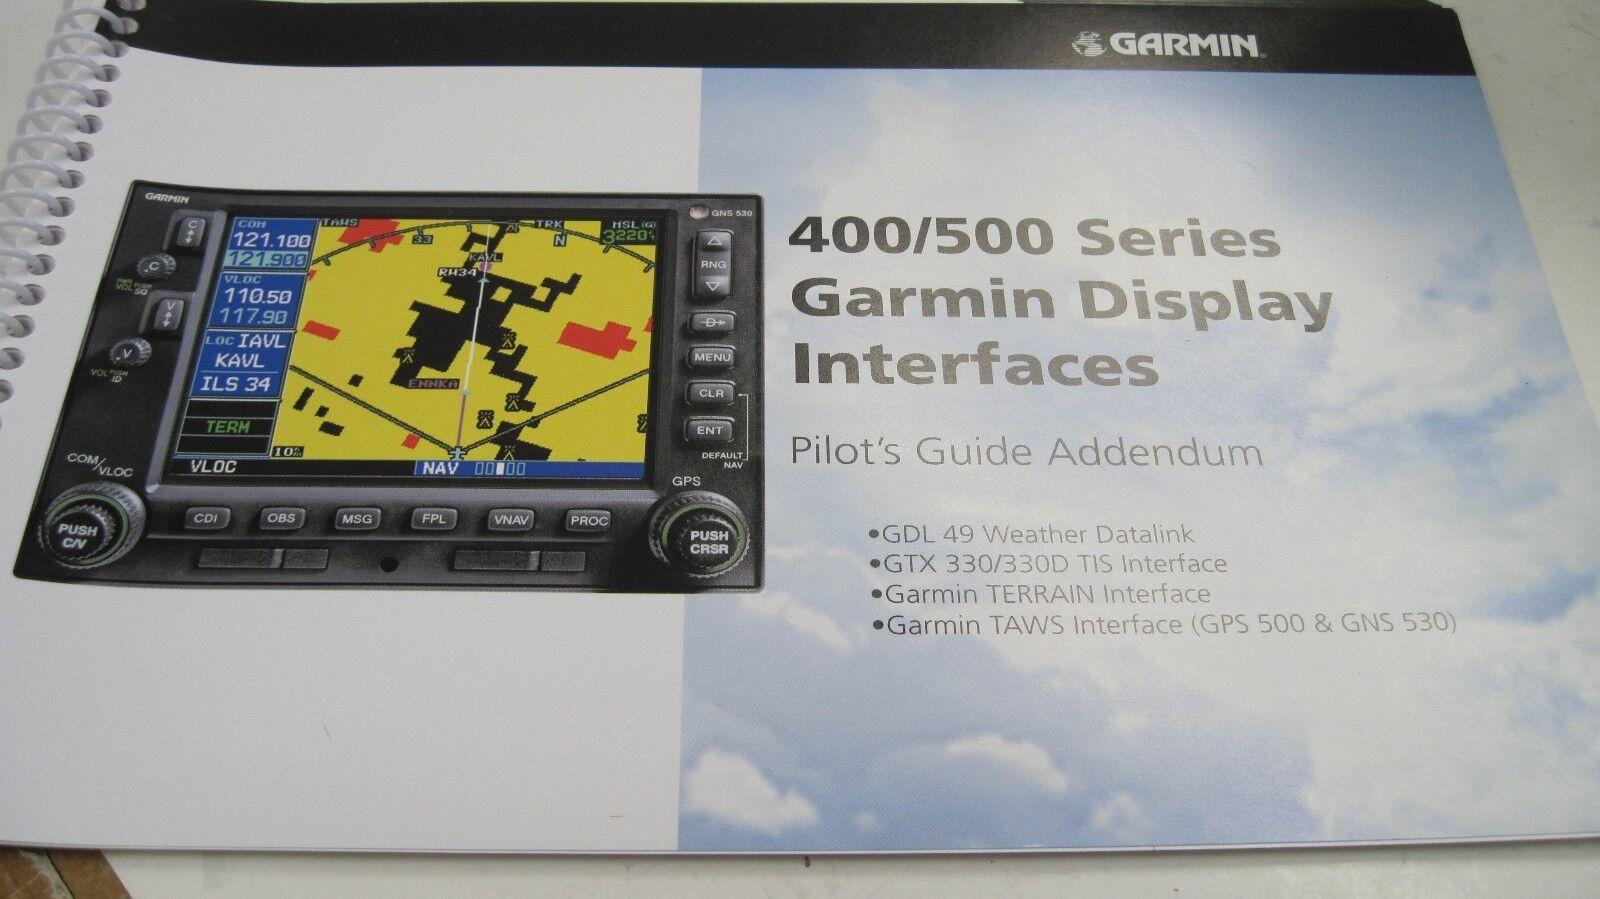 Garmin 400/500 Series Garmin Display Interfaces Pilots Guide Addendum